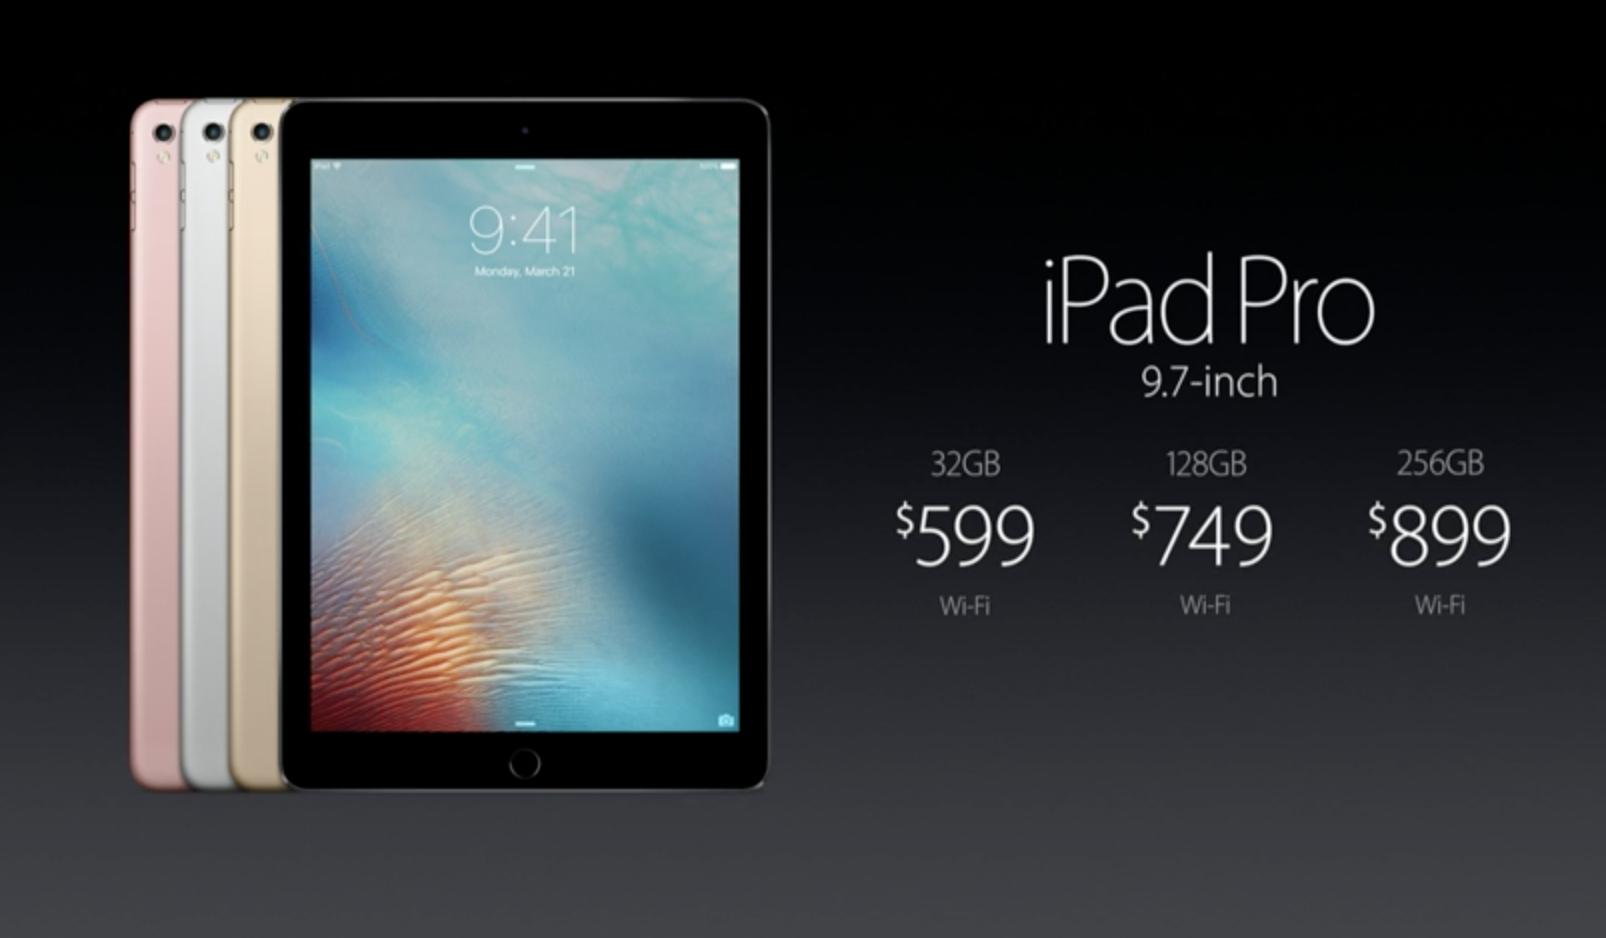 iPad Pro Pris